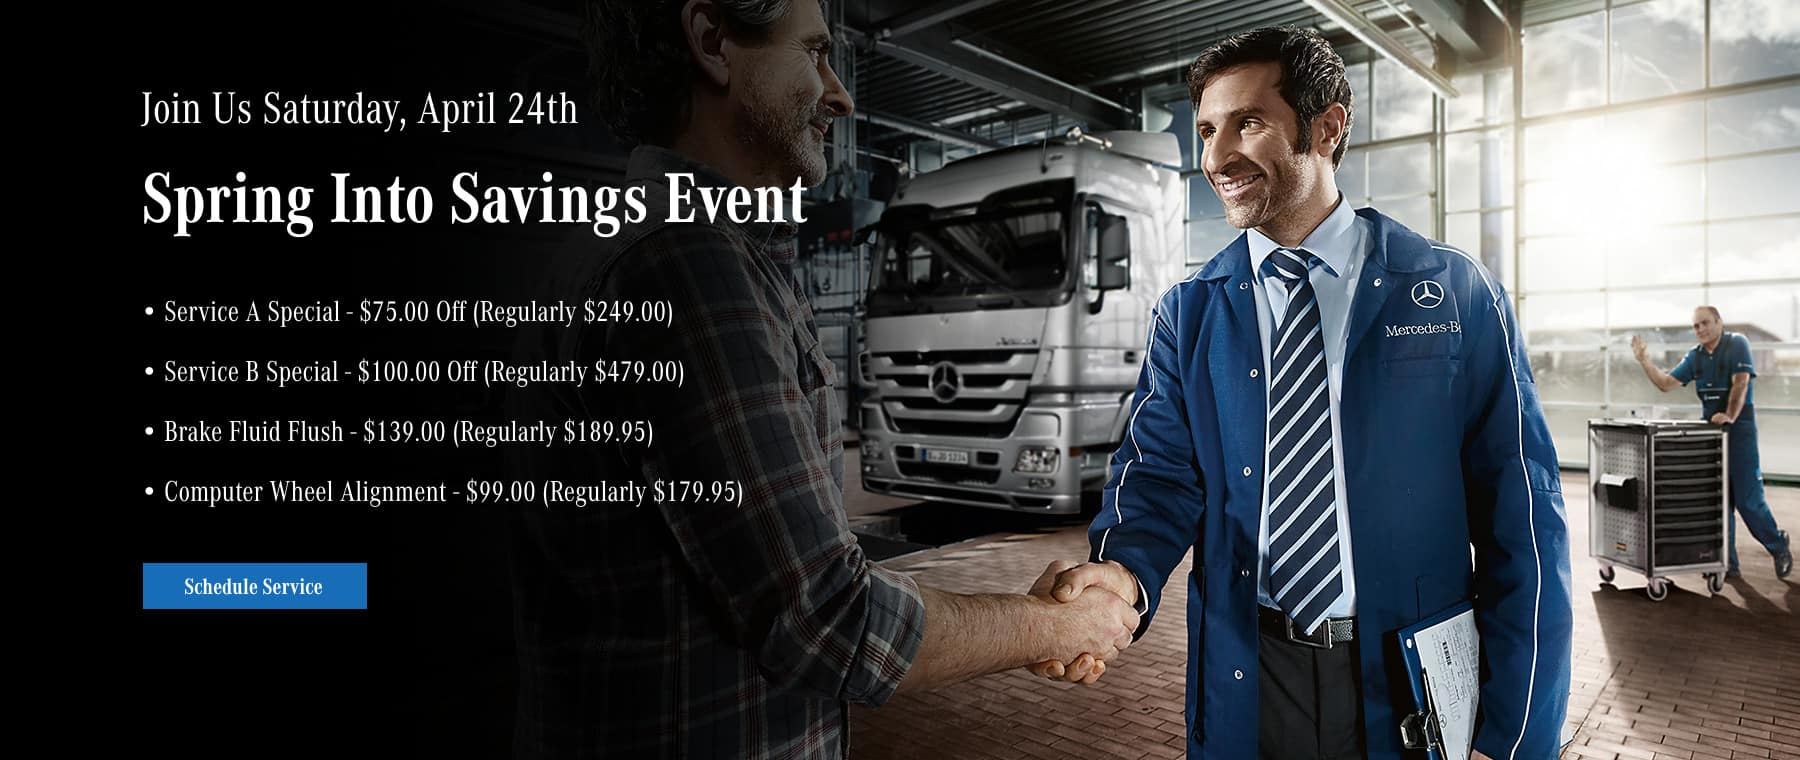 Spring Into Savings Event